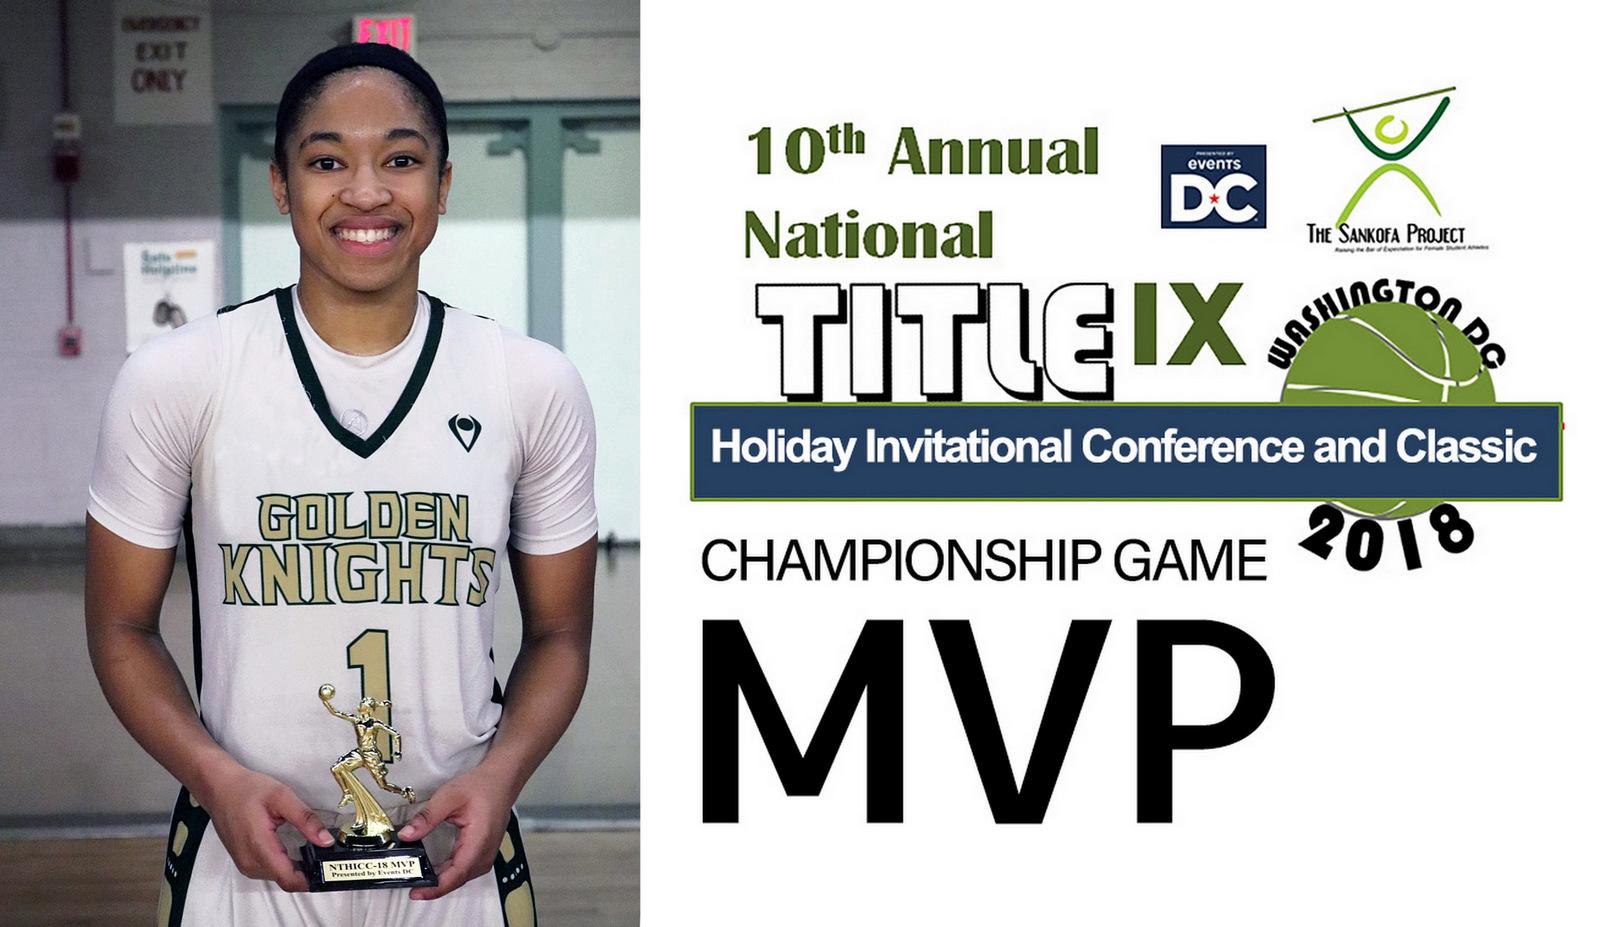 MVP: Title IX Holiday Classic